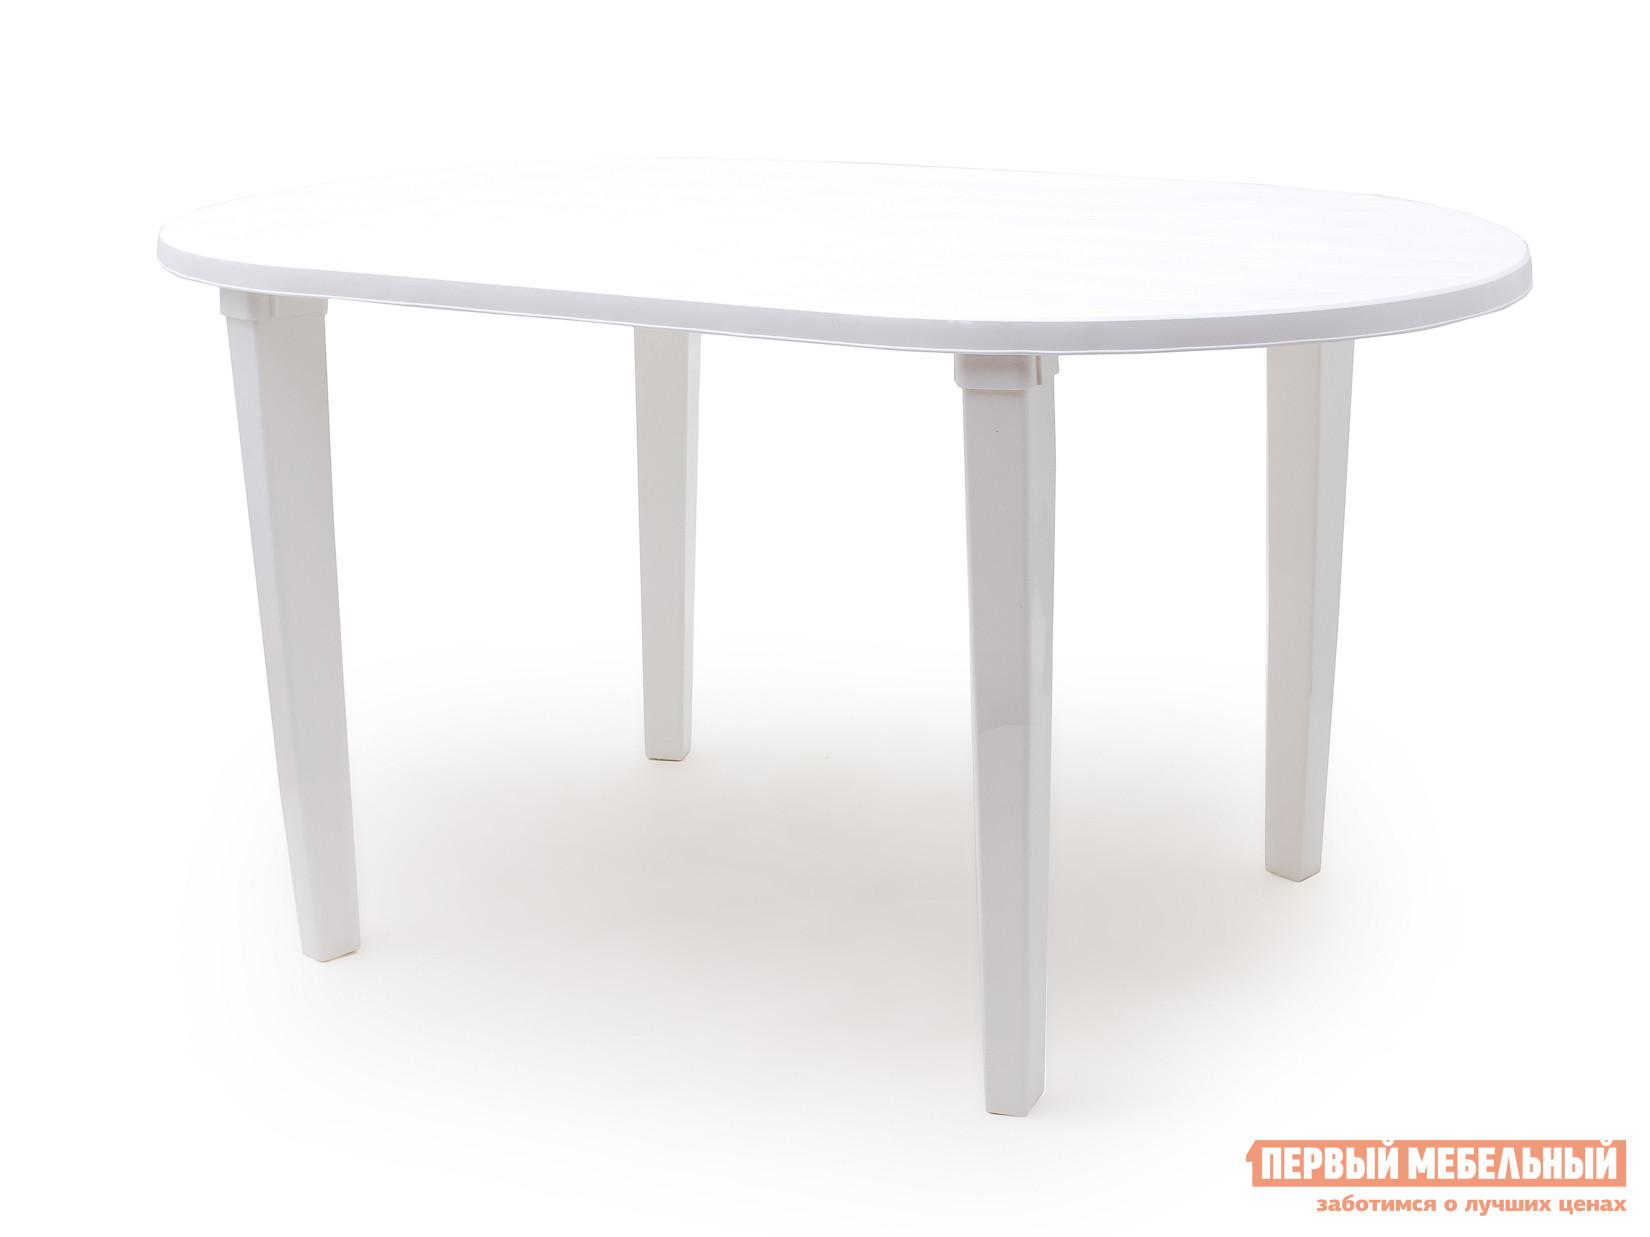 Пластиковый стол Стандарт Пластик Стол овальный (1400х800х710) мм Белый